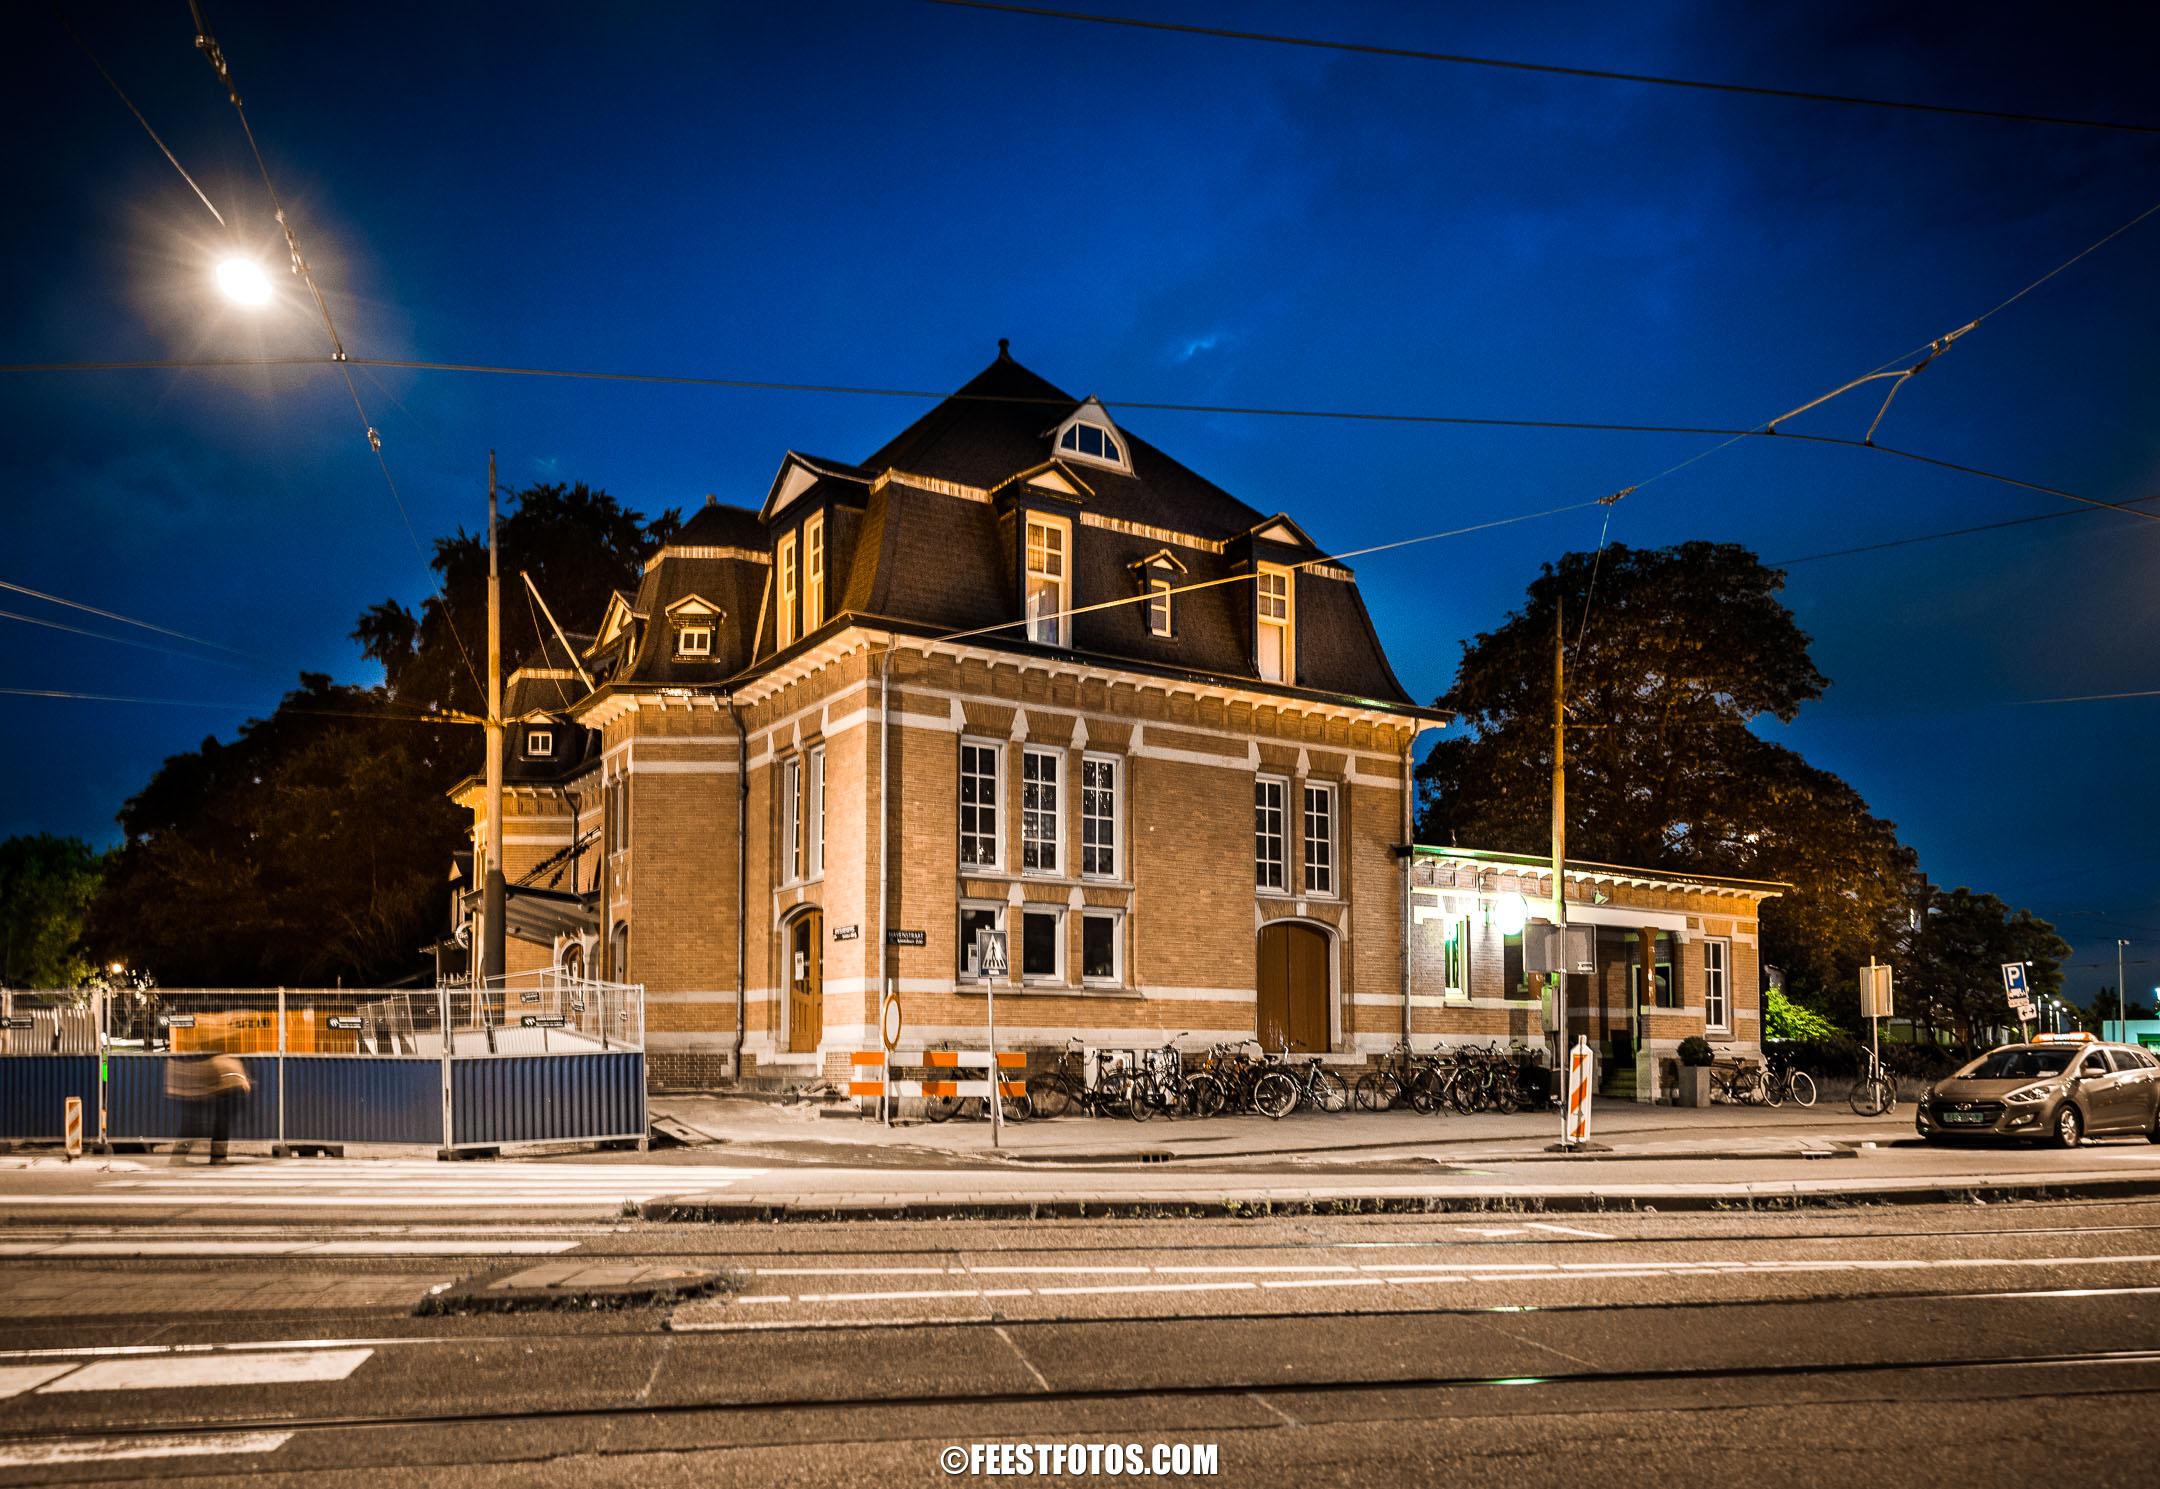 Haarlemmerstation